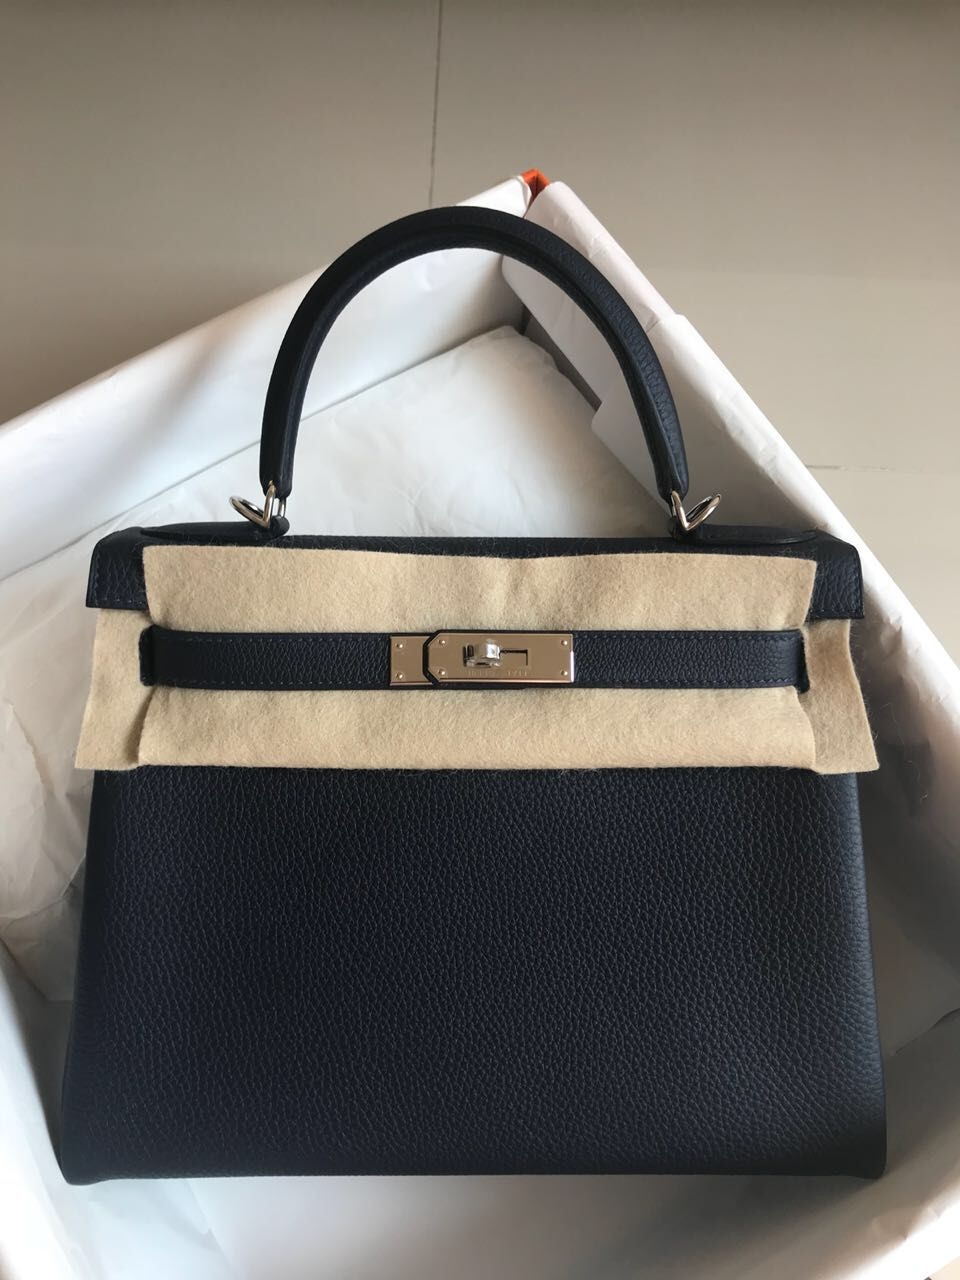 7208c8e47a8e Hermès Kelly 28 Bleu Nuit Togo Palladium Hardware PHW C Stamp 2018  kelly28   thefrenchhunter